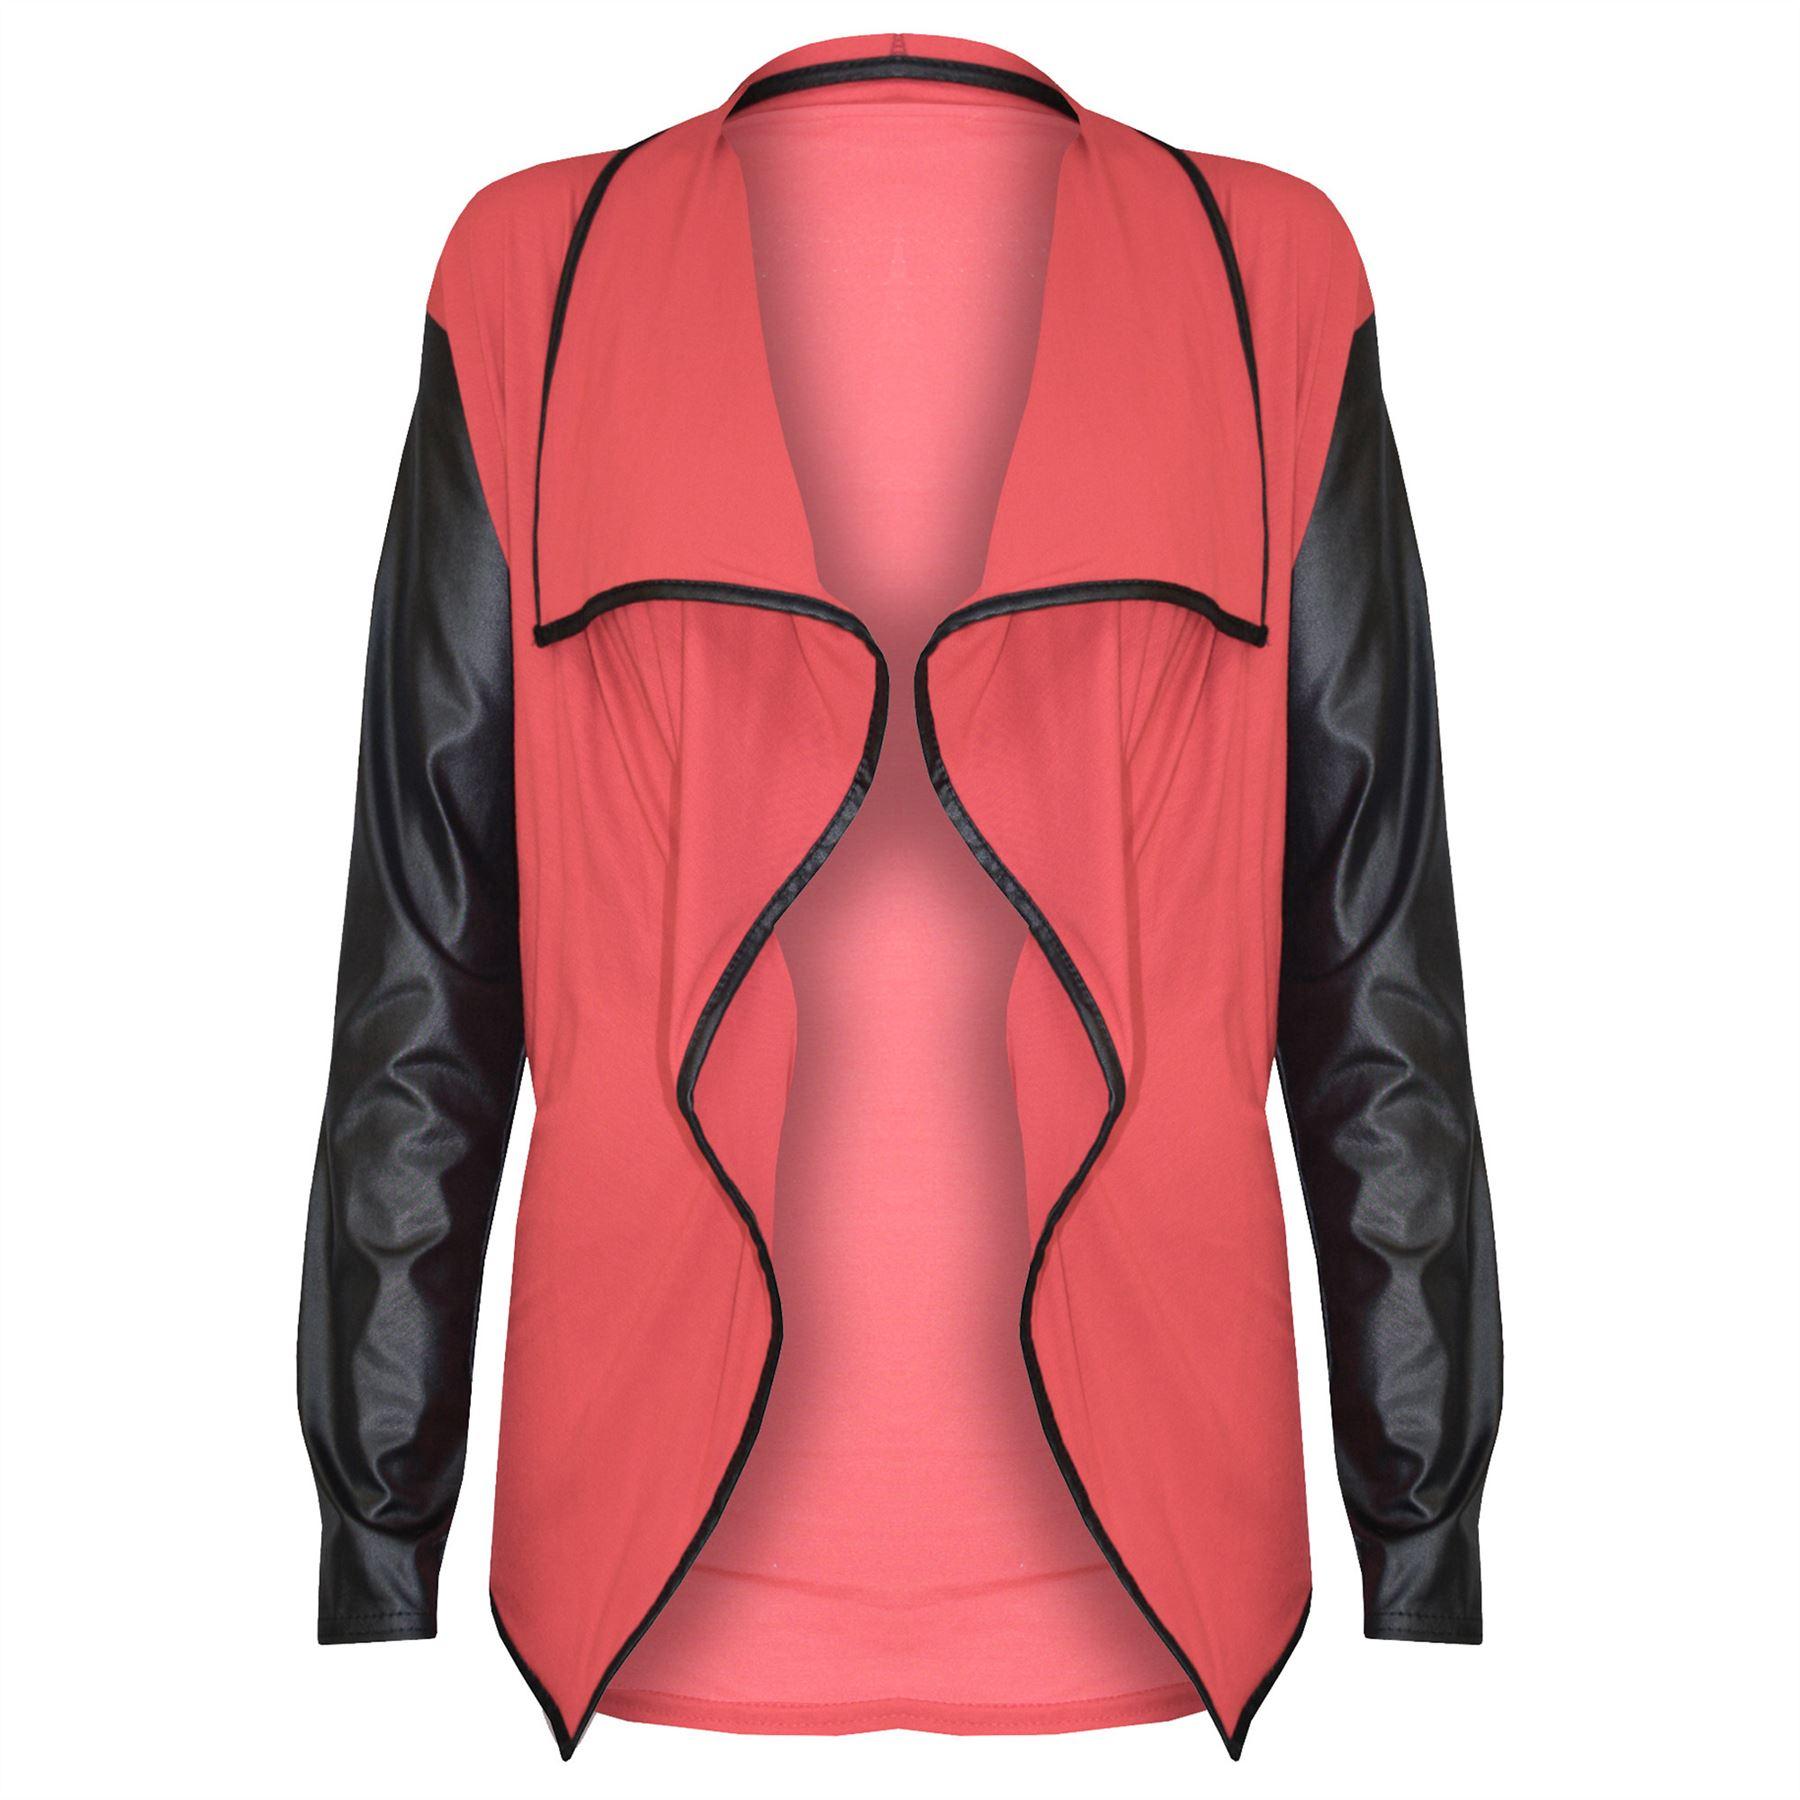 Womens-Ladies-Open-Waterfall-PVC-Wet-Look-Long-Sleeves-Front-Blazer-Cardigan-Top thumbnail 13